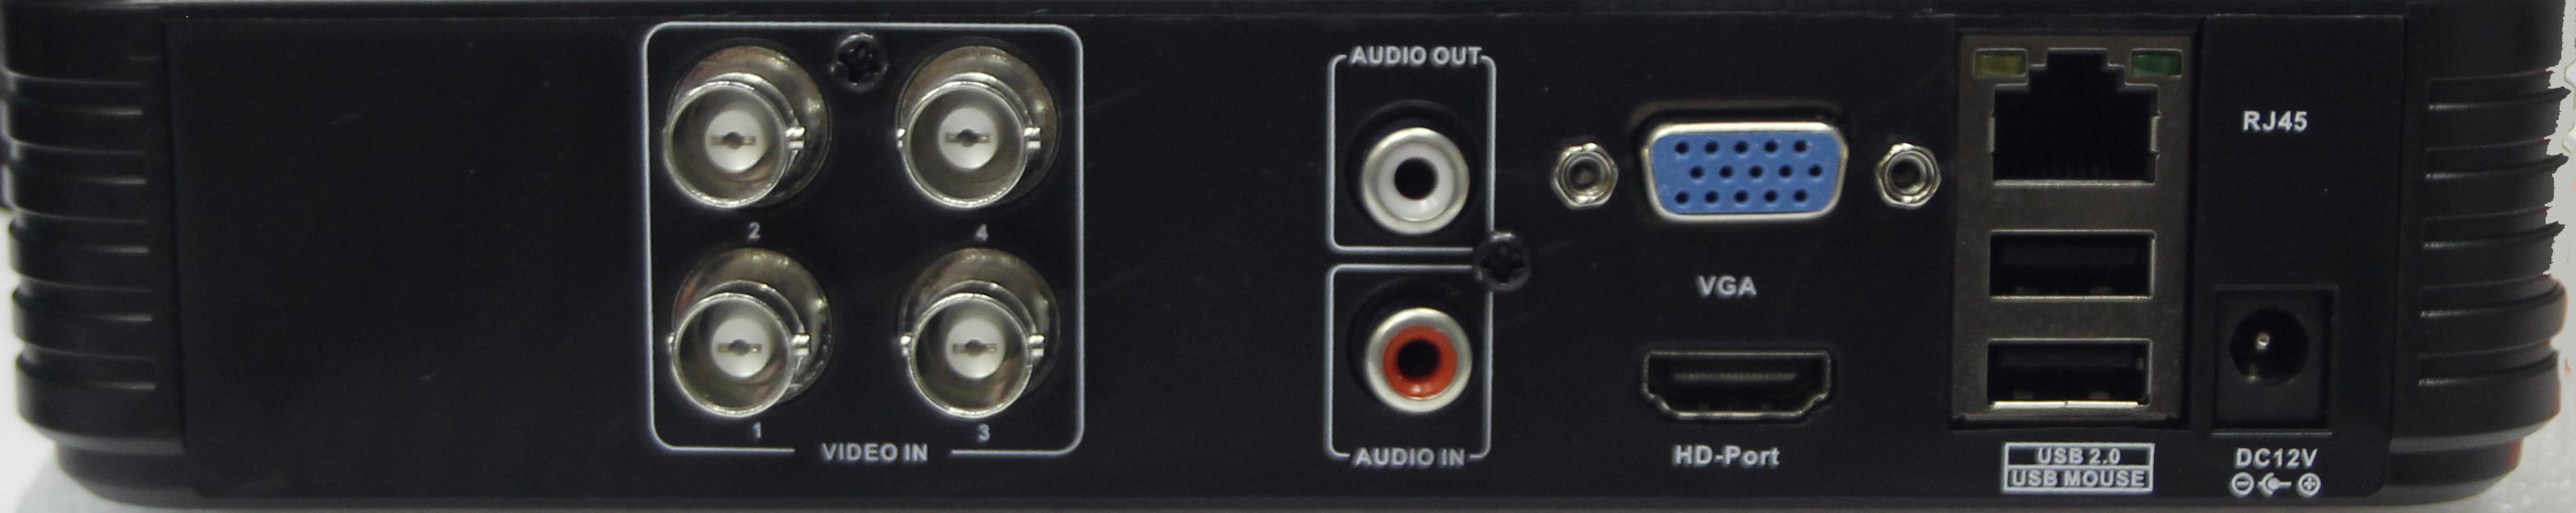 Dvr Ibrido 4 Canali 720P D1 Retro - SETIK